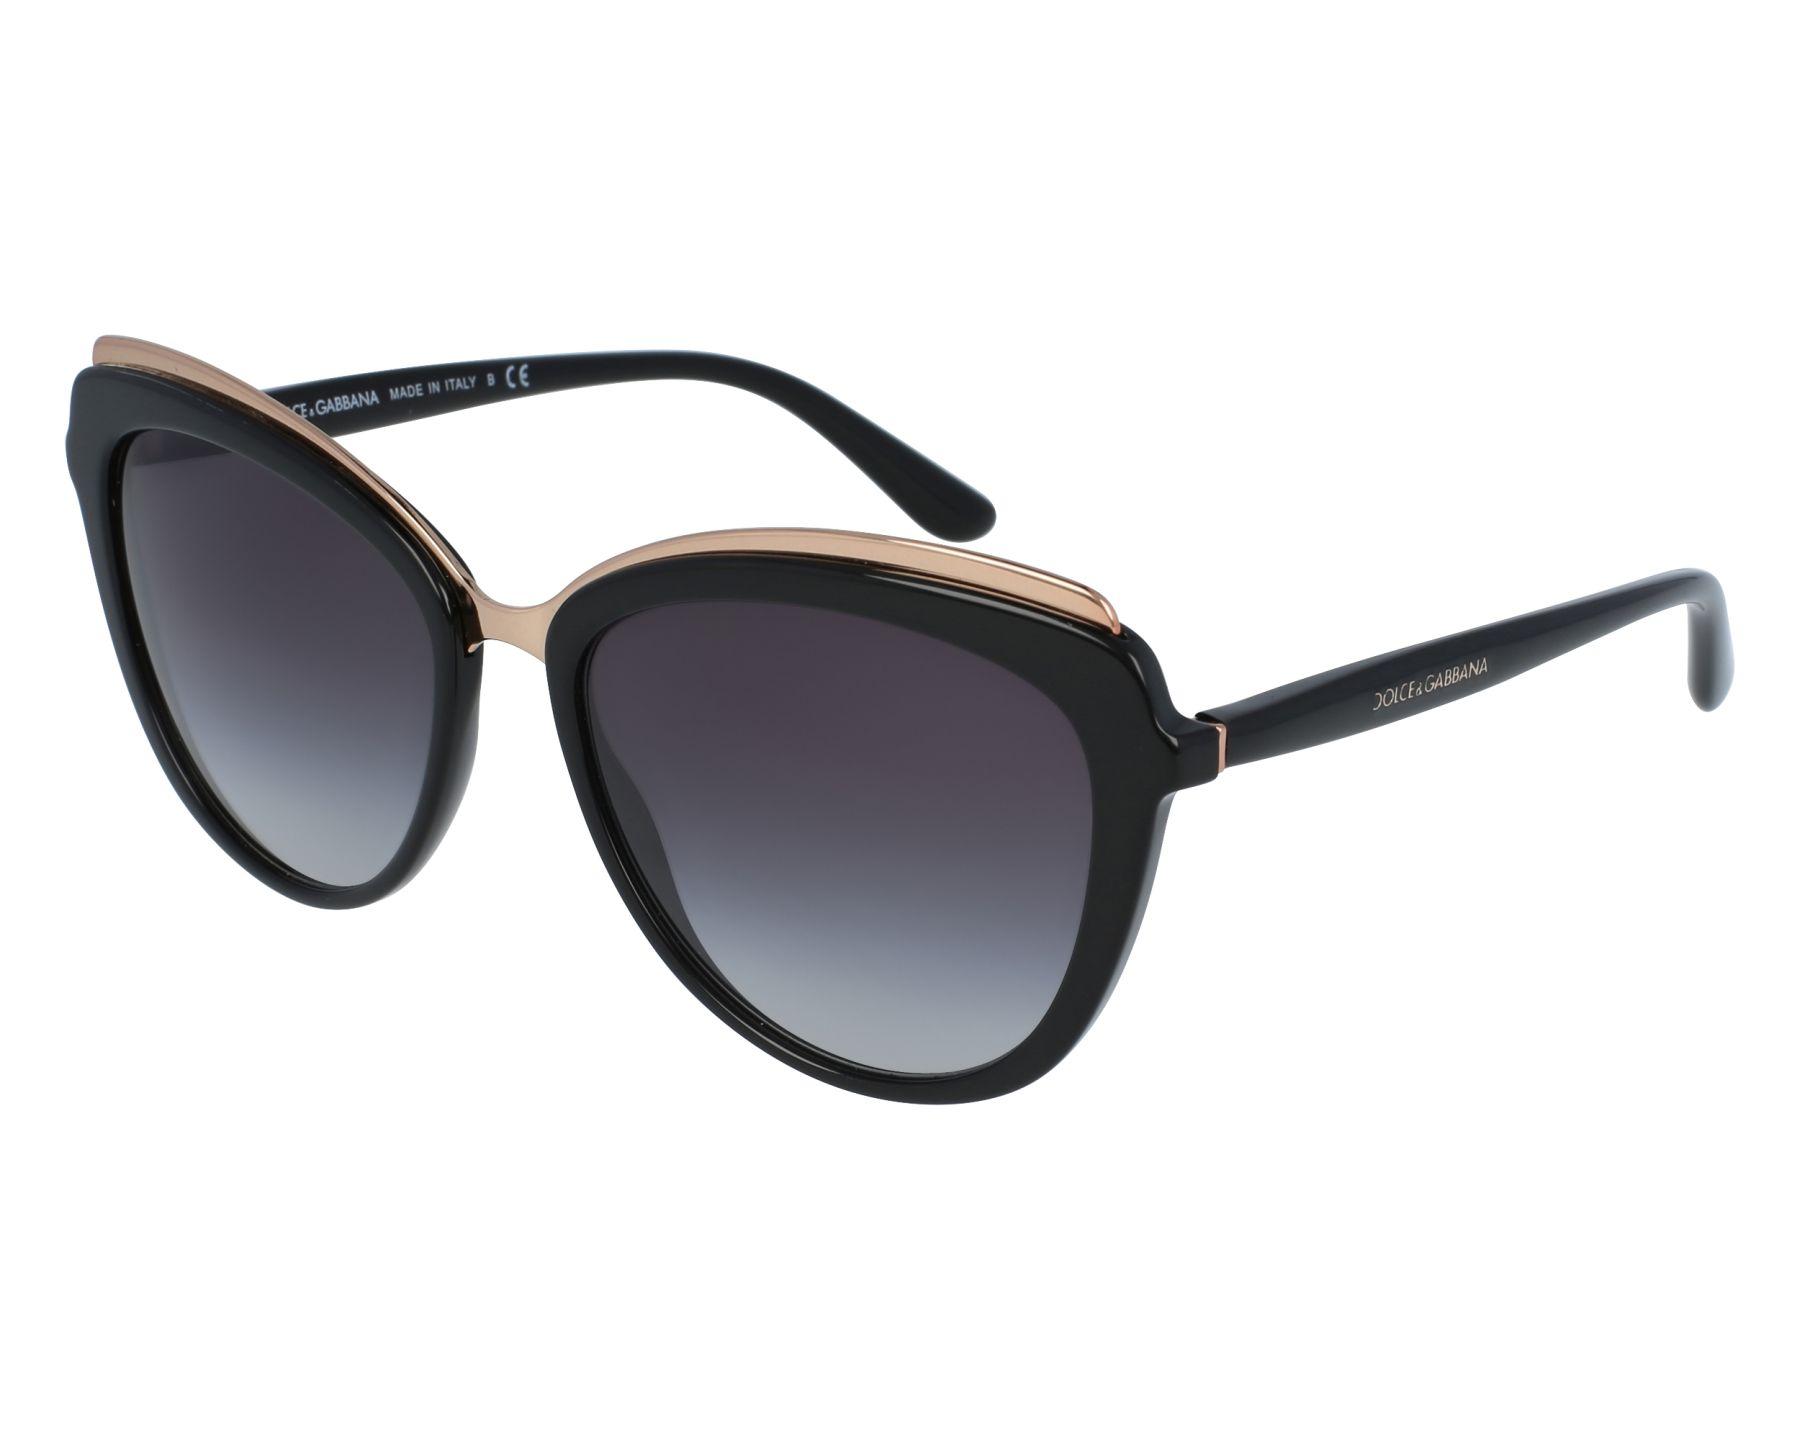 Dolce & Gabbana DG4304 501/8G 57-17 E2rA15hDeL